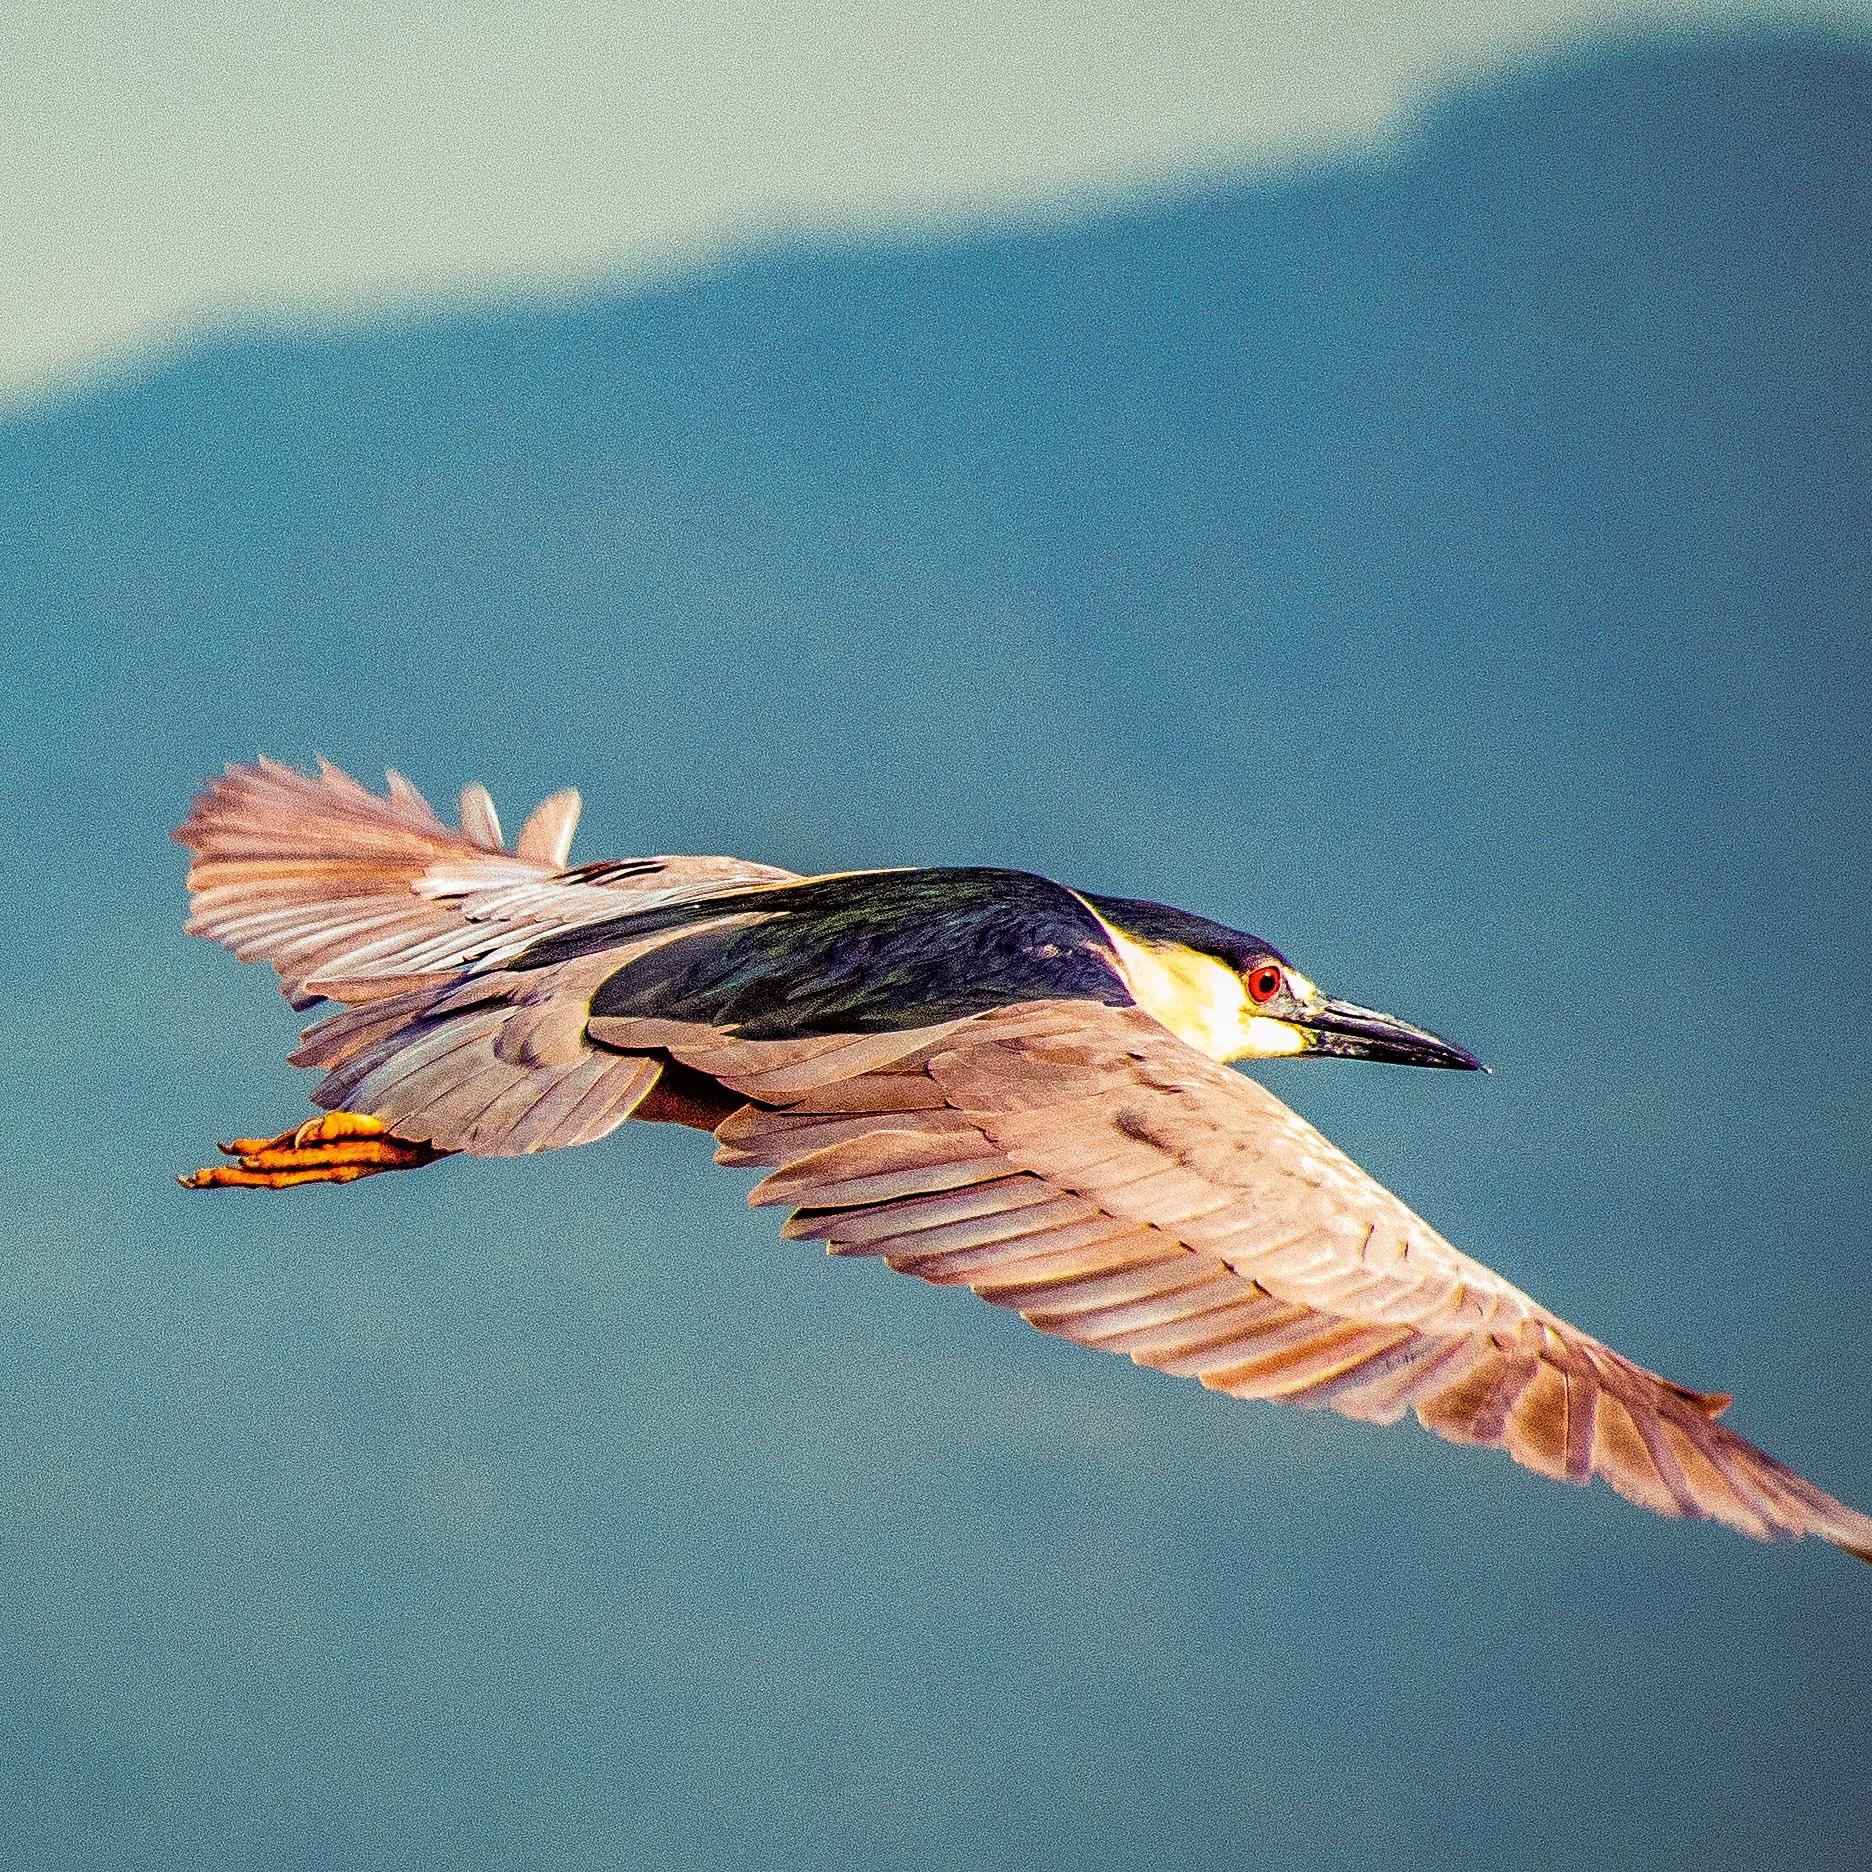 The bird's flight. by Bianca Rocha França